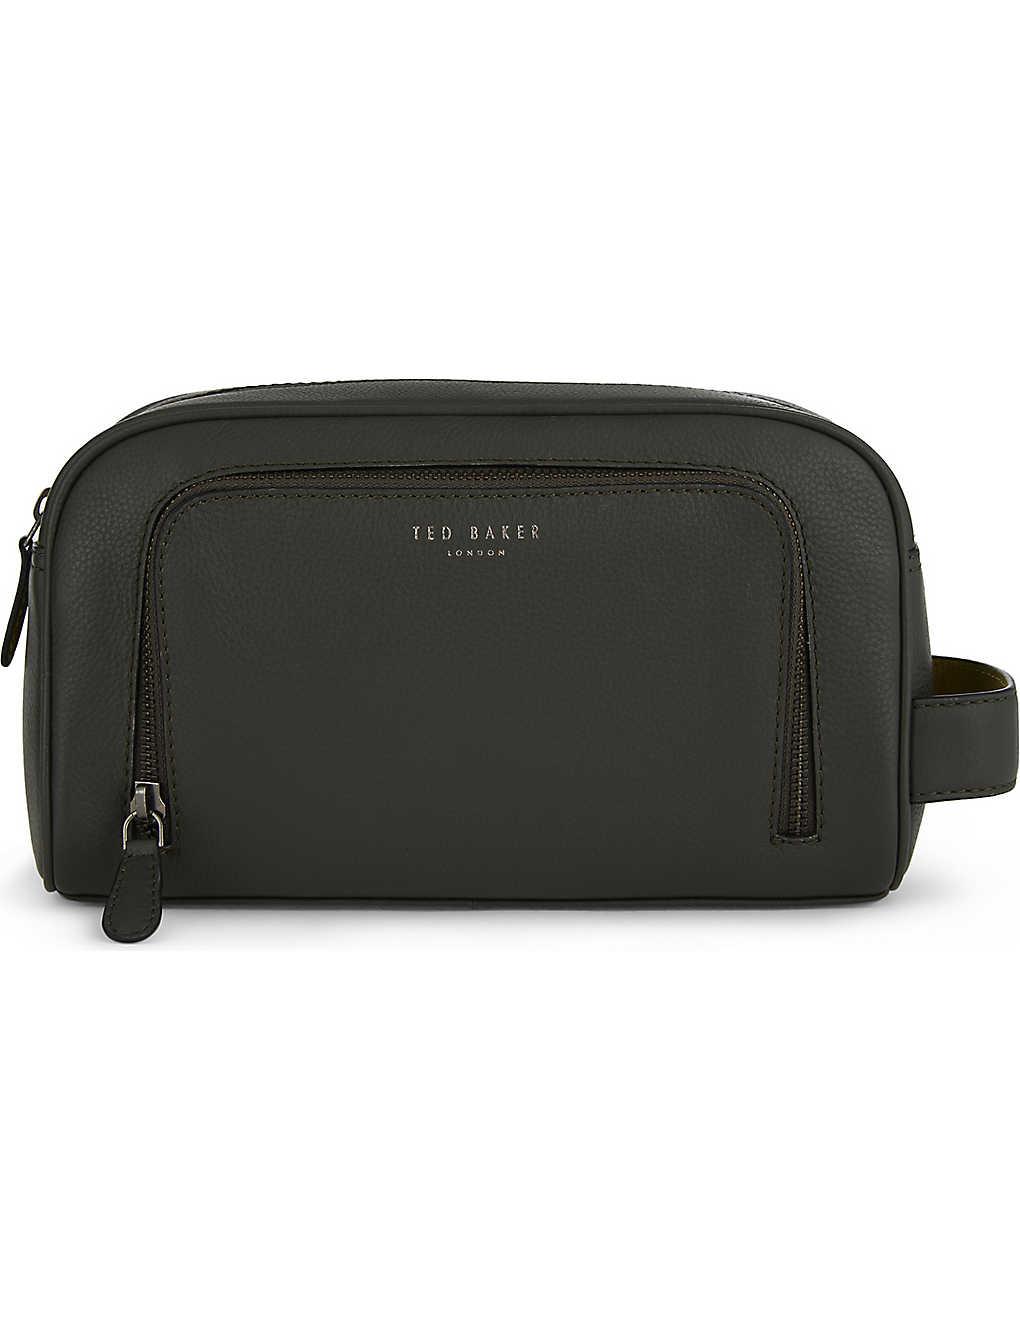 13013bb3c724 TED BAKER - Onyahed leather wash bag